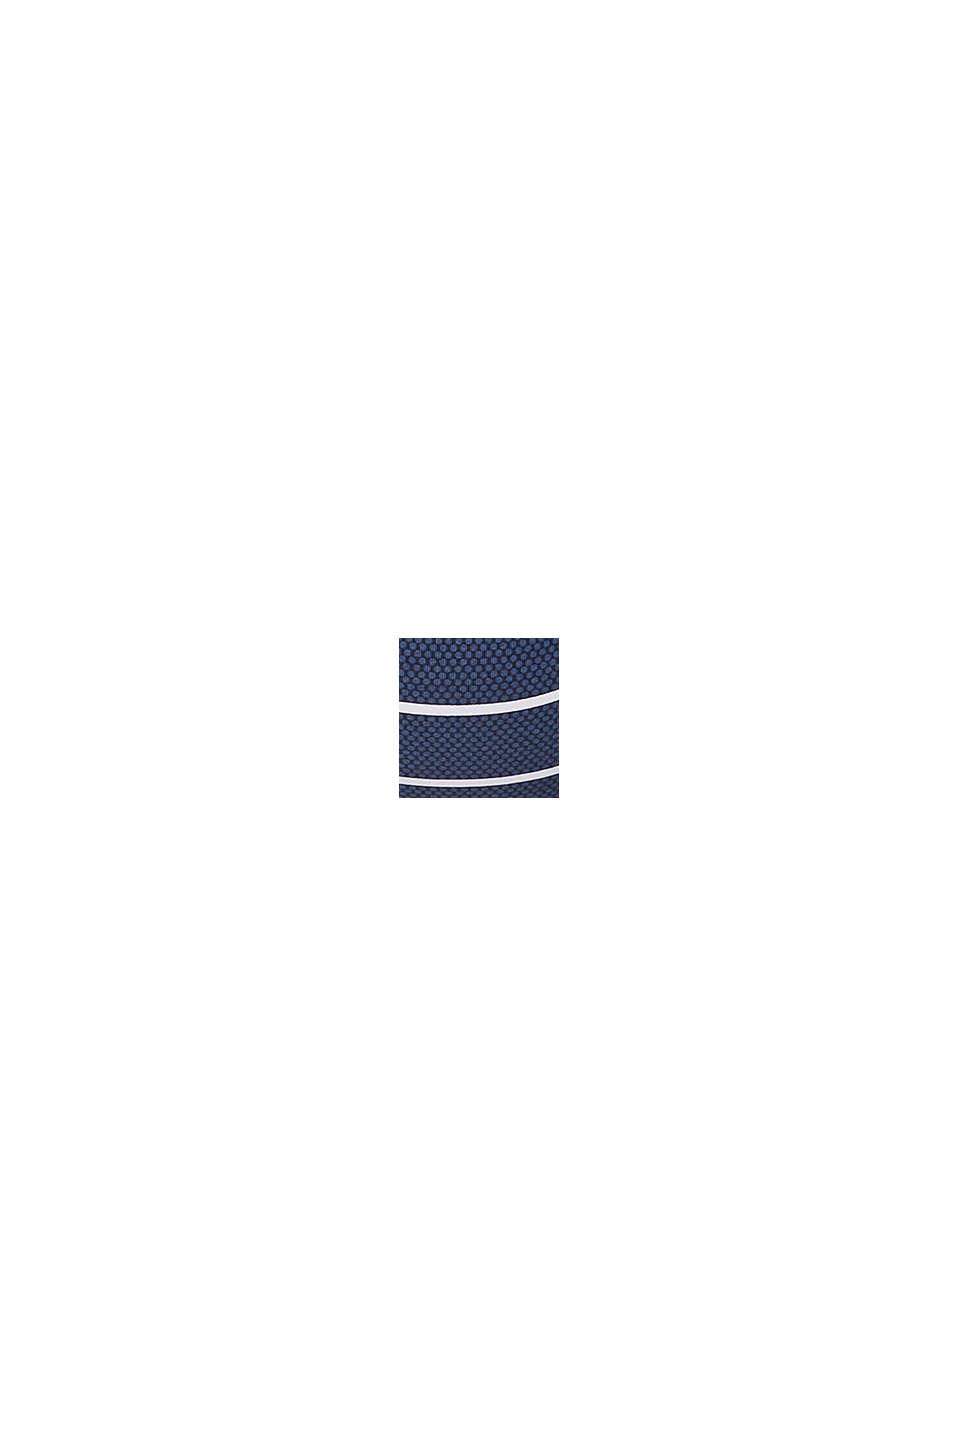 Vatteret balconette-top med striber, DARK BLUE, swatch